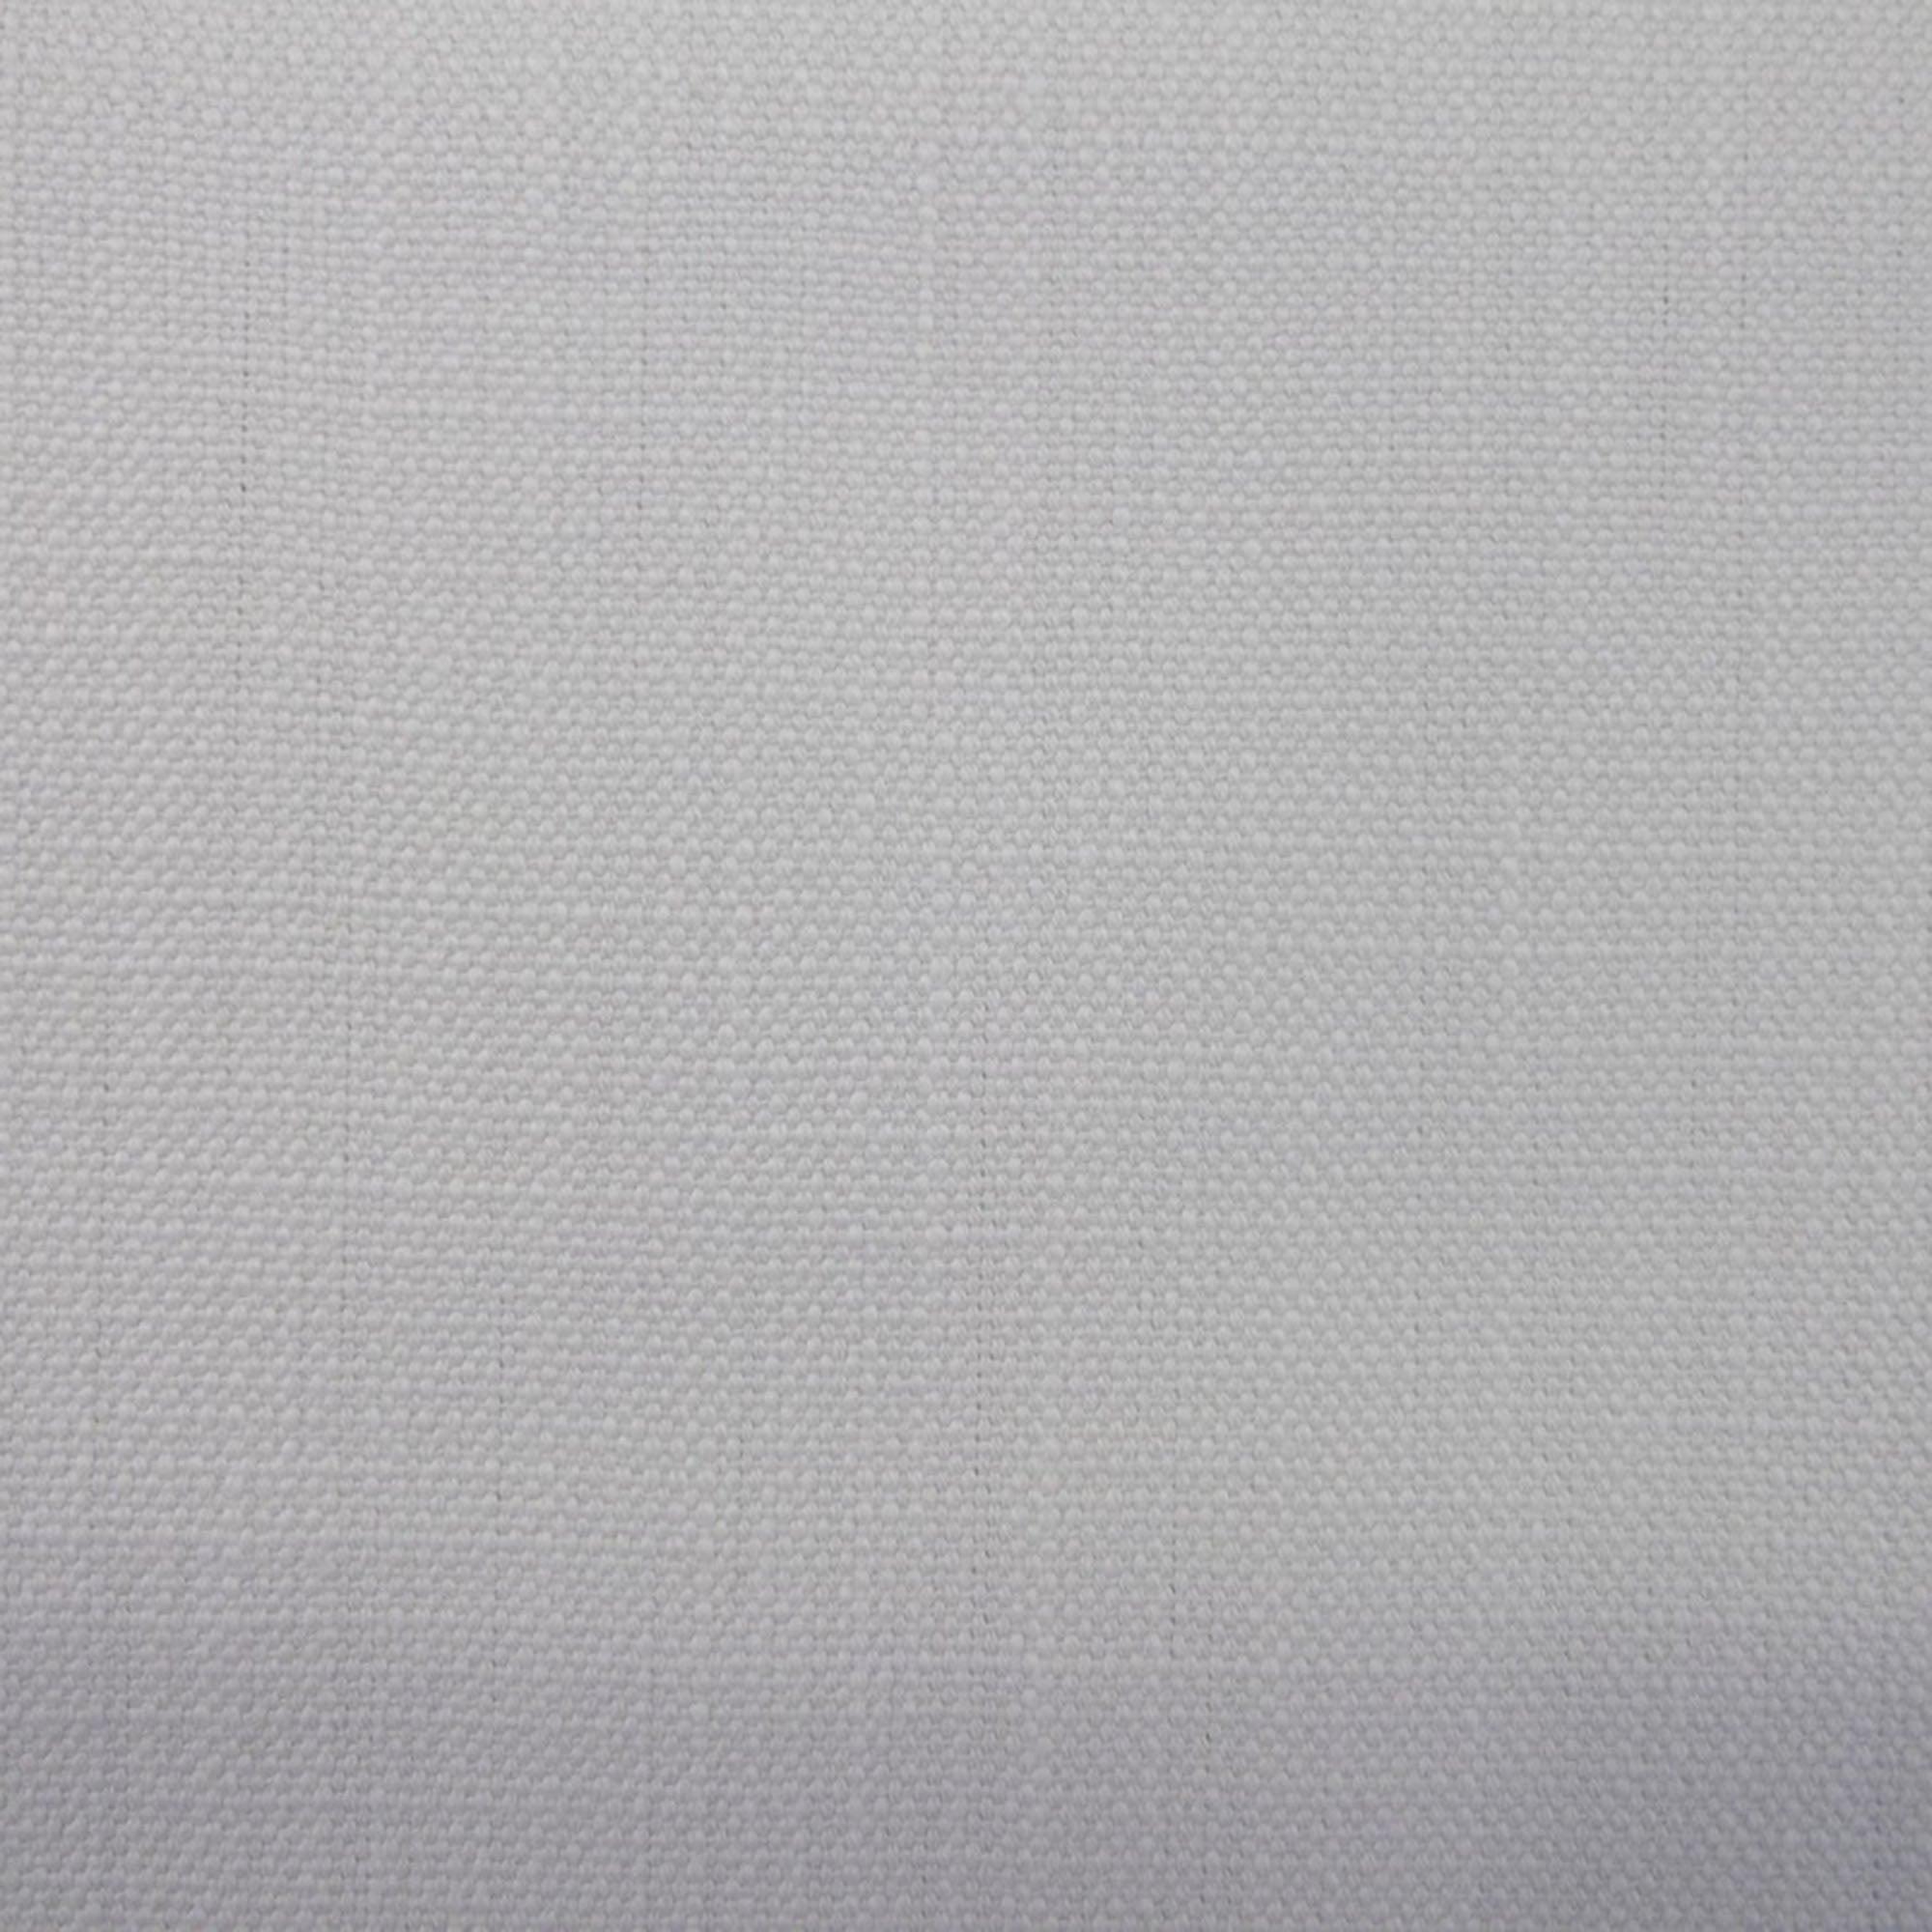 Photo of Savanna fabric light brown / natural